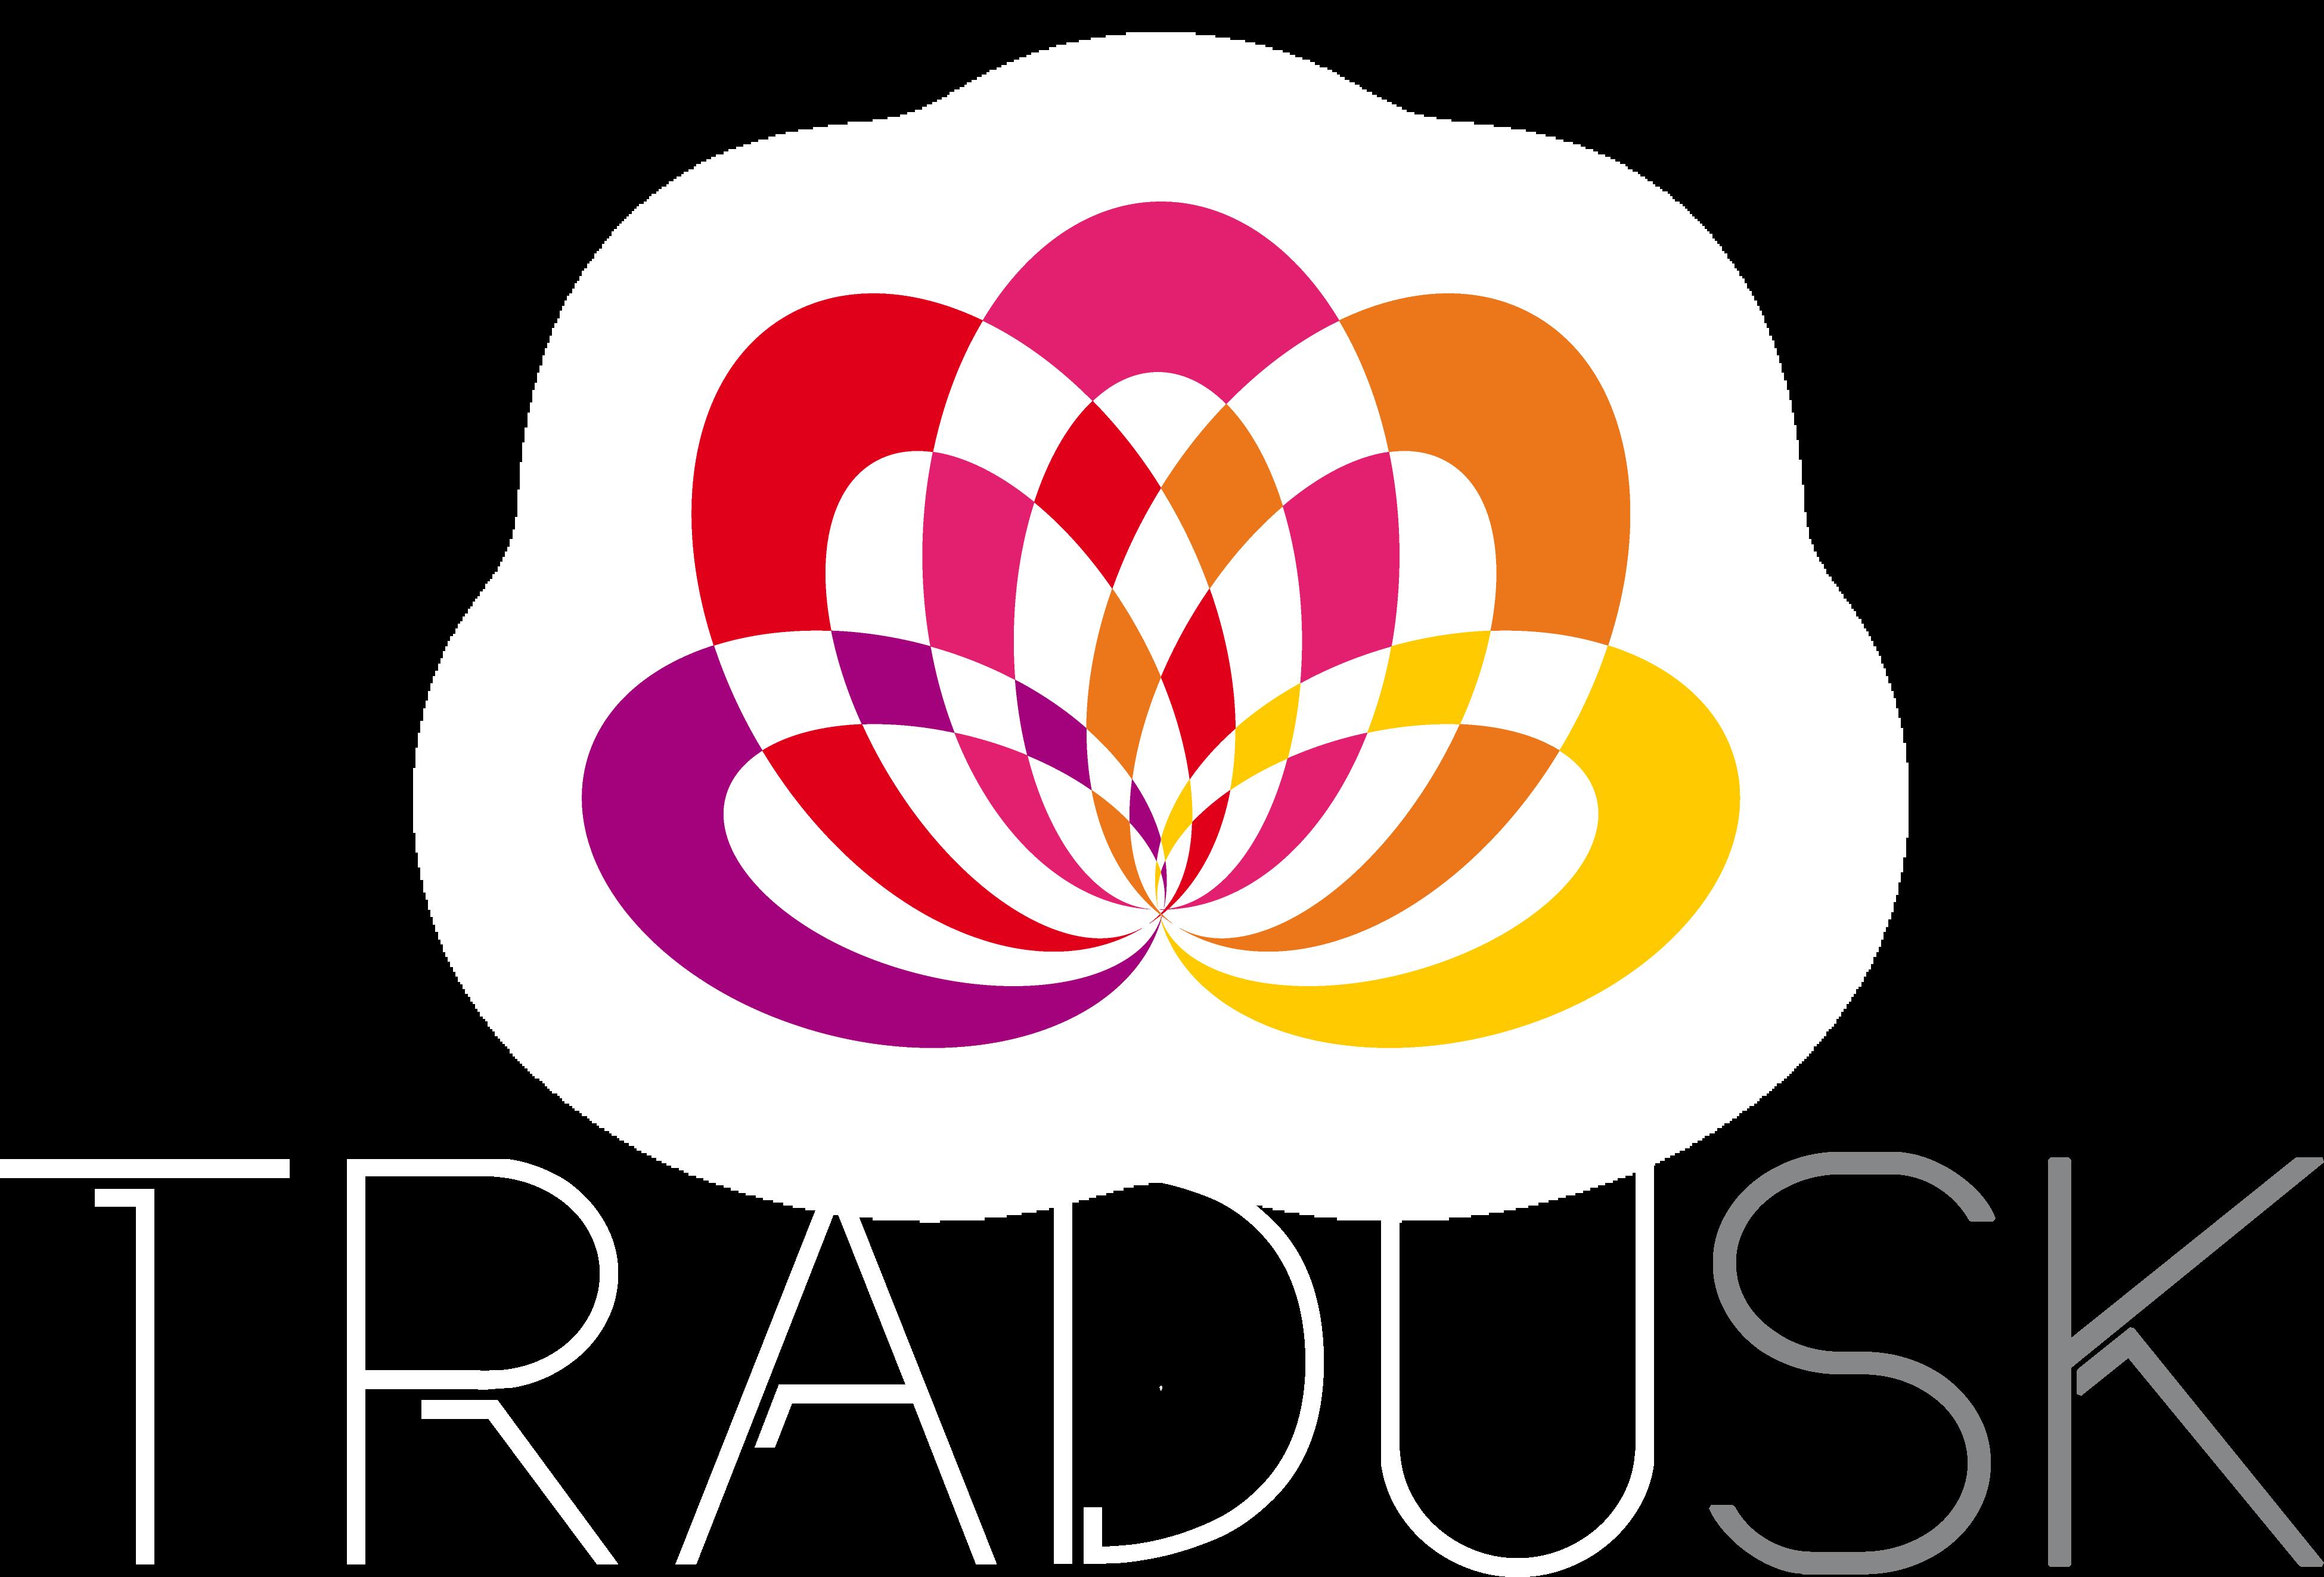 TRADUSK Traductions commerciales, certifiées Logo